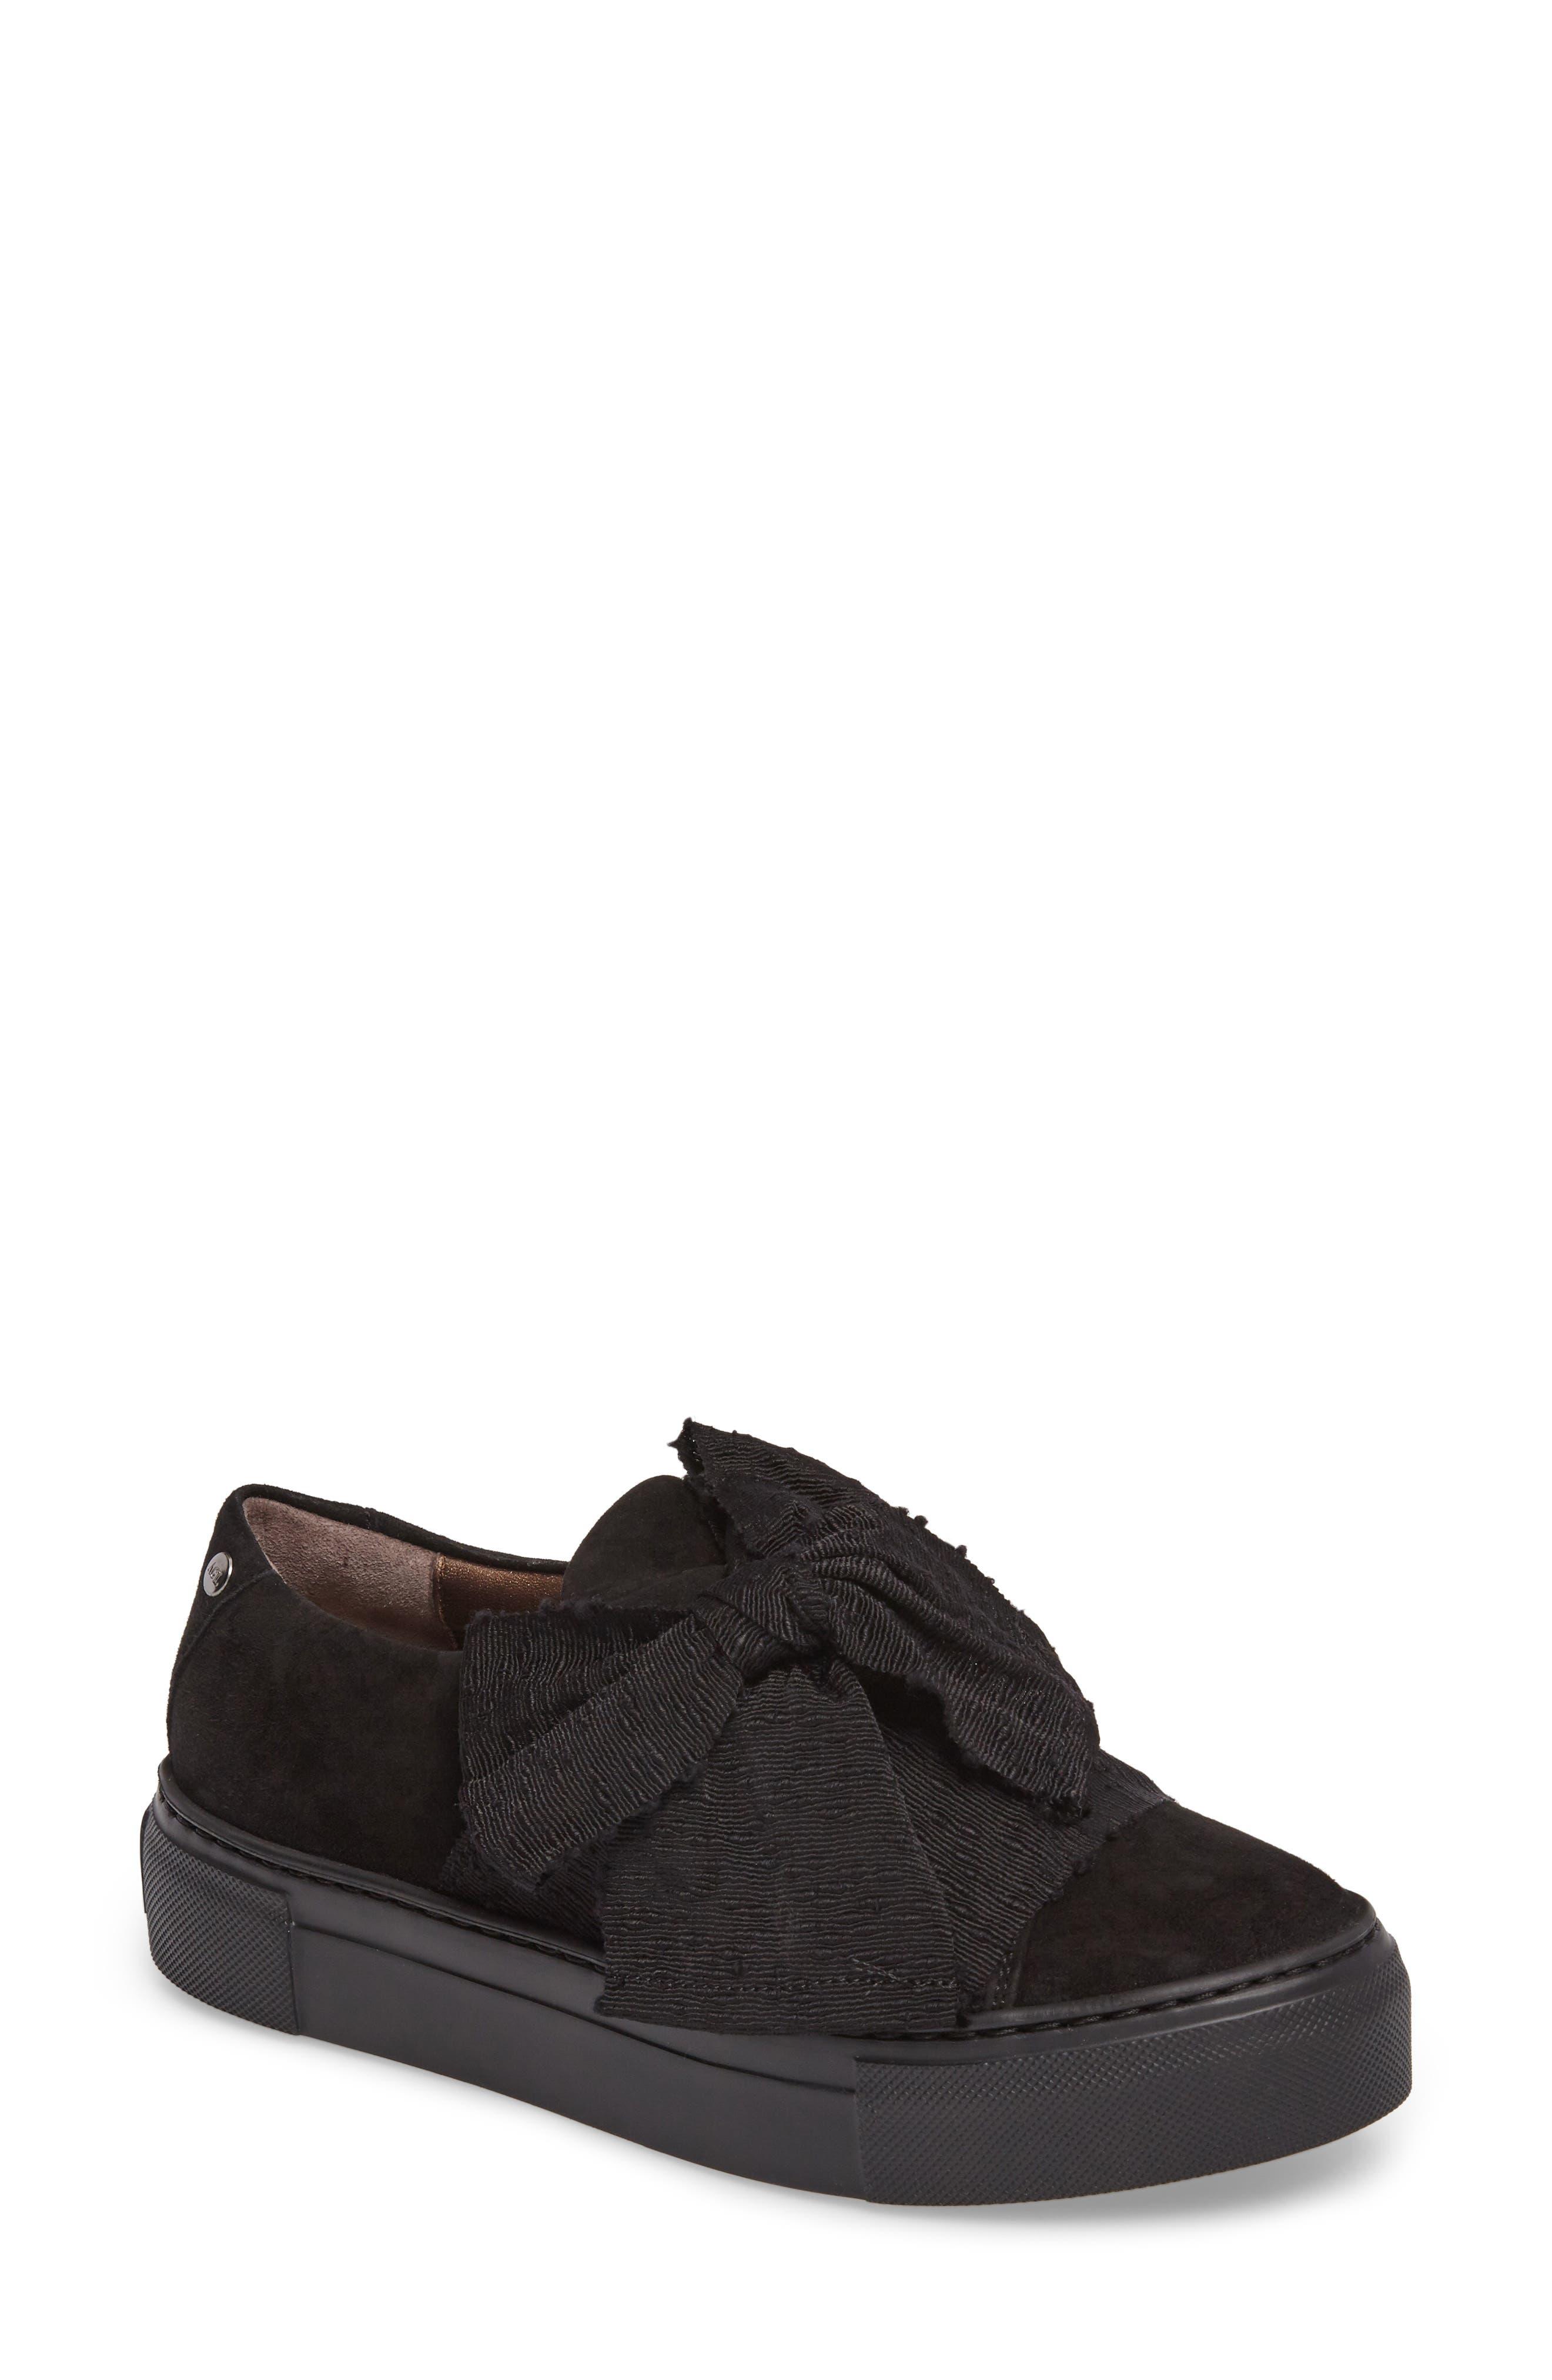 Alternate Image 1 Selected - AGL Bow Platform Sneaker (Women)